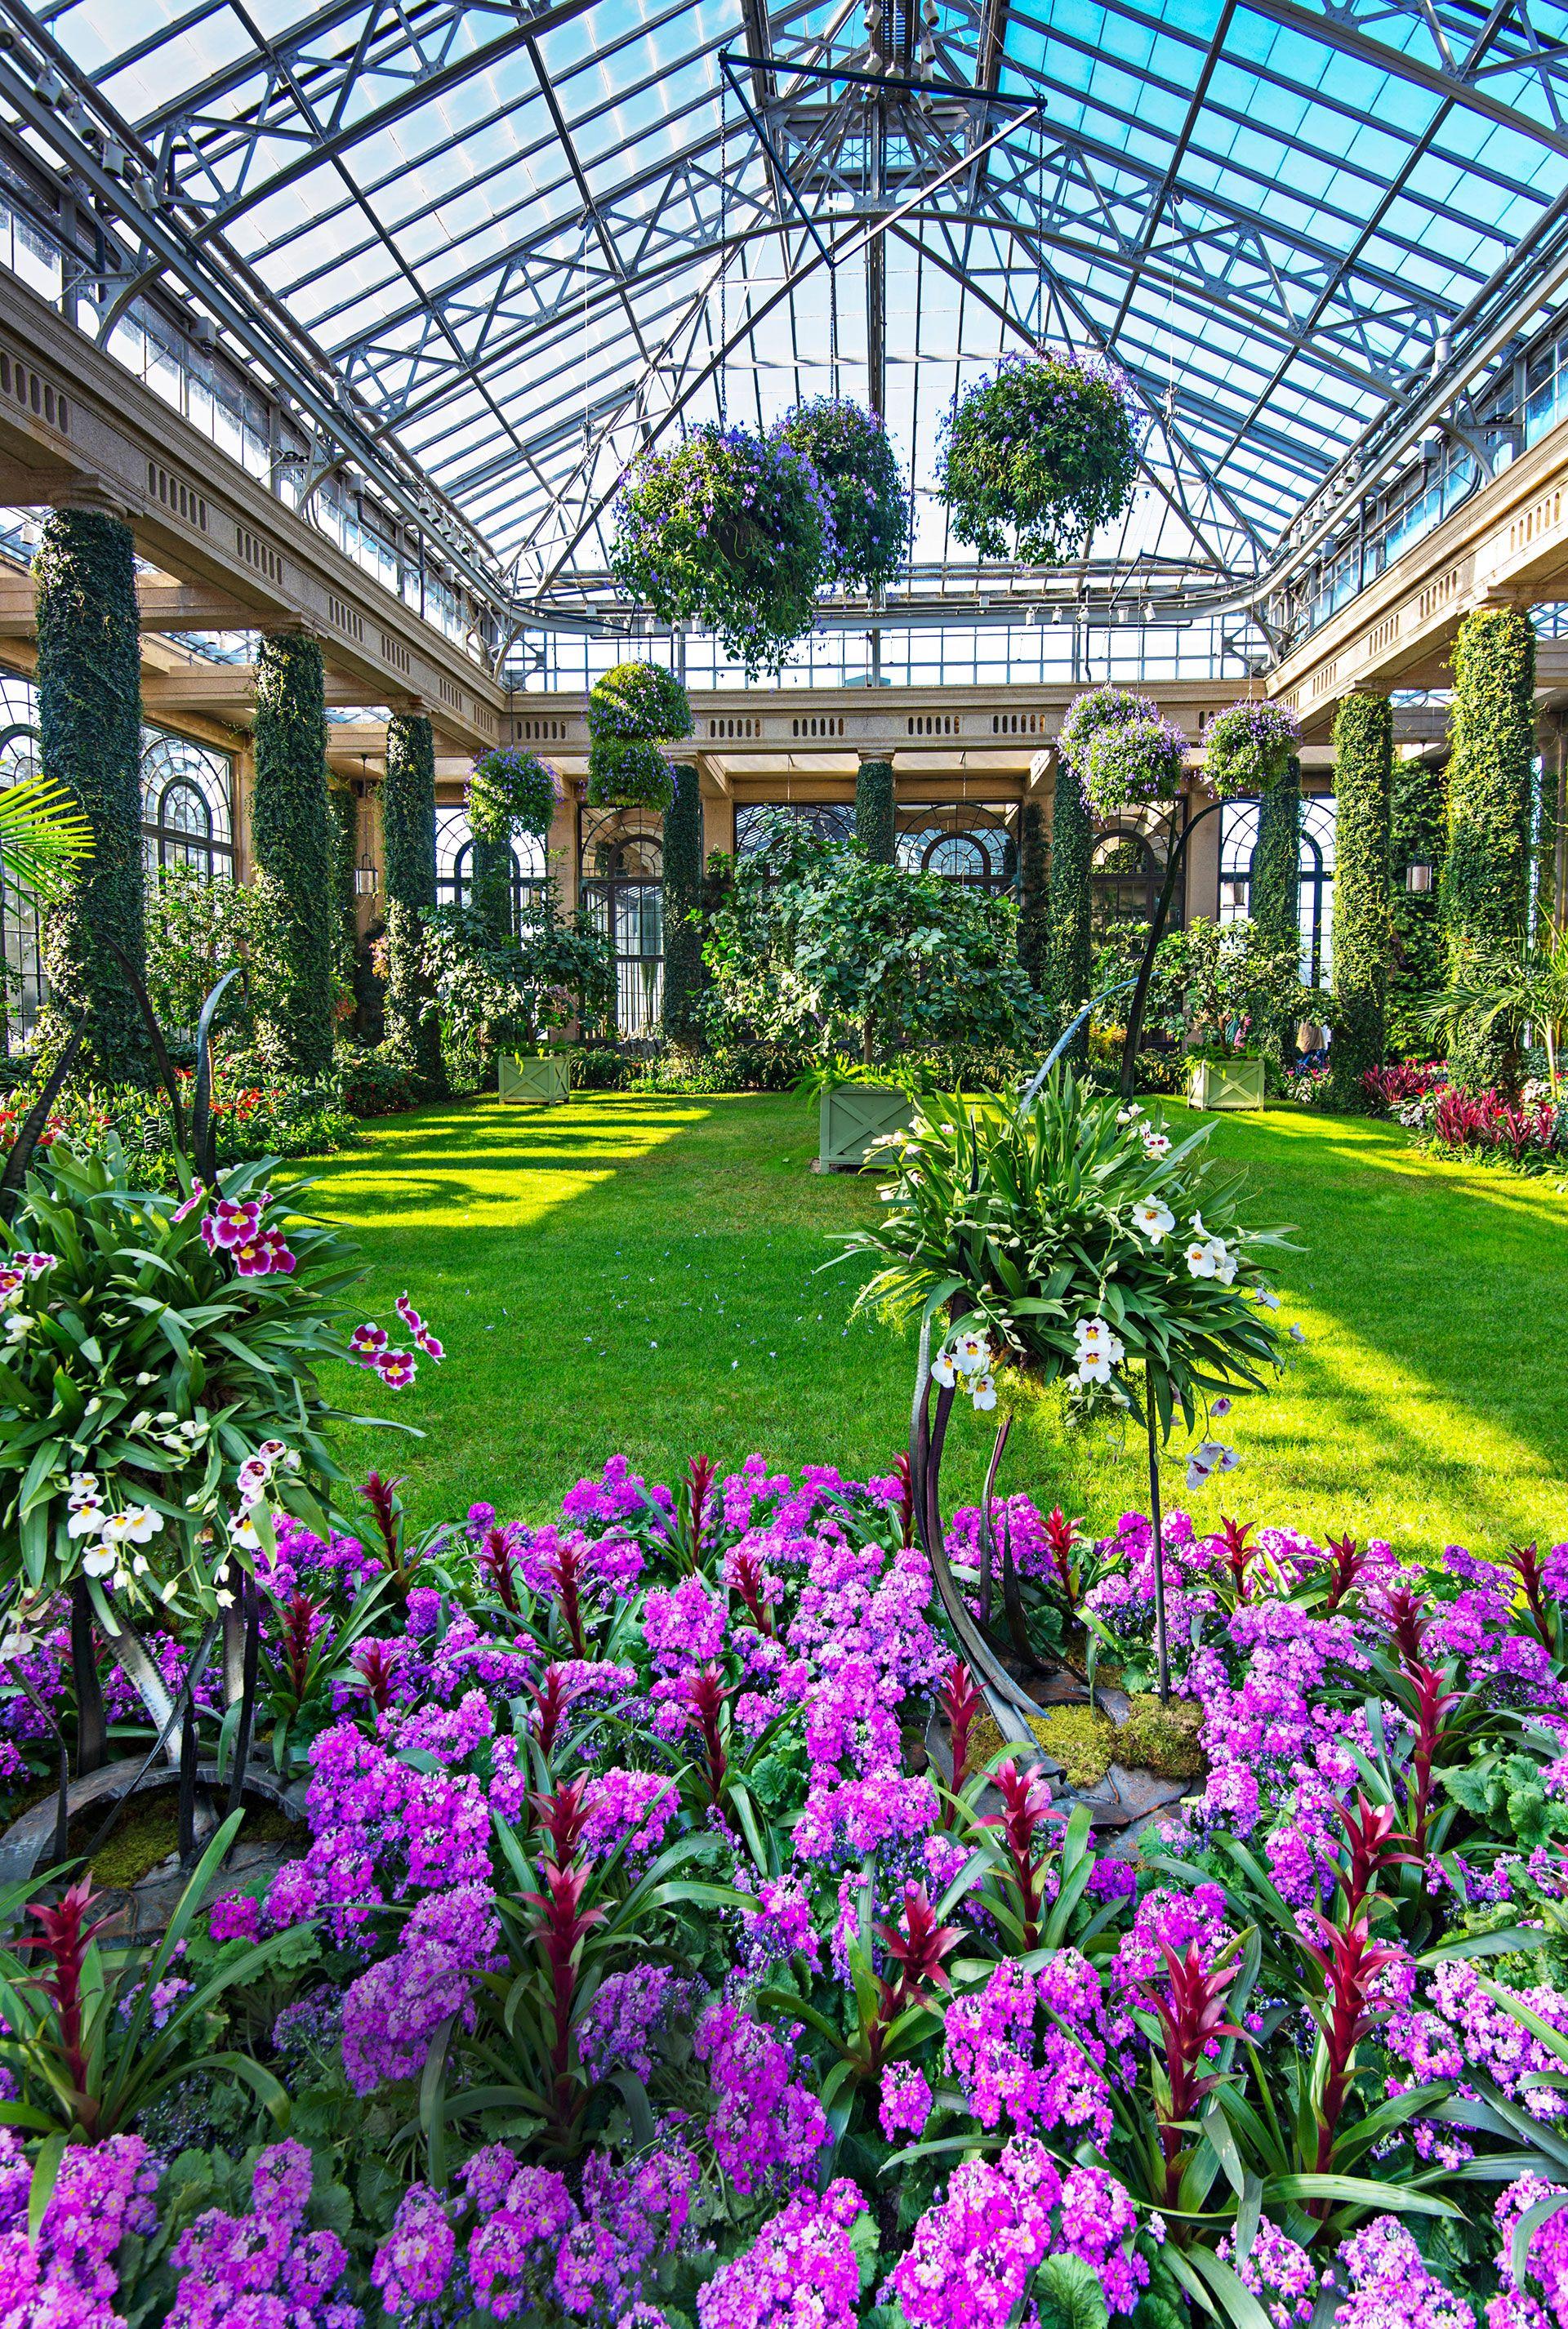 402ea2db0596853ec6e7c19da37cb3ec - Longwood Gardens Best Time To Visit